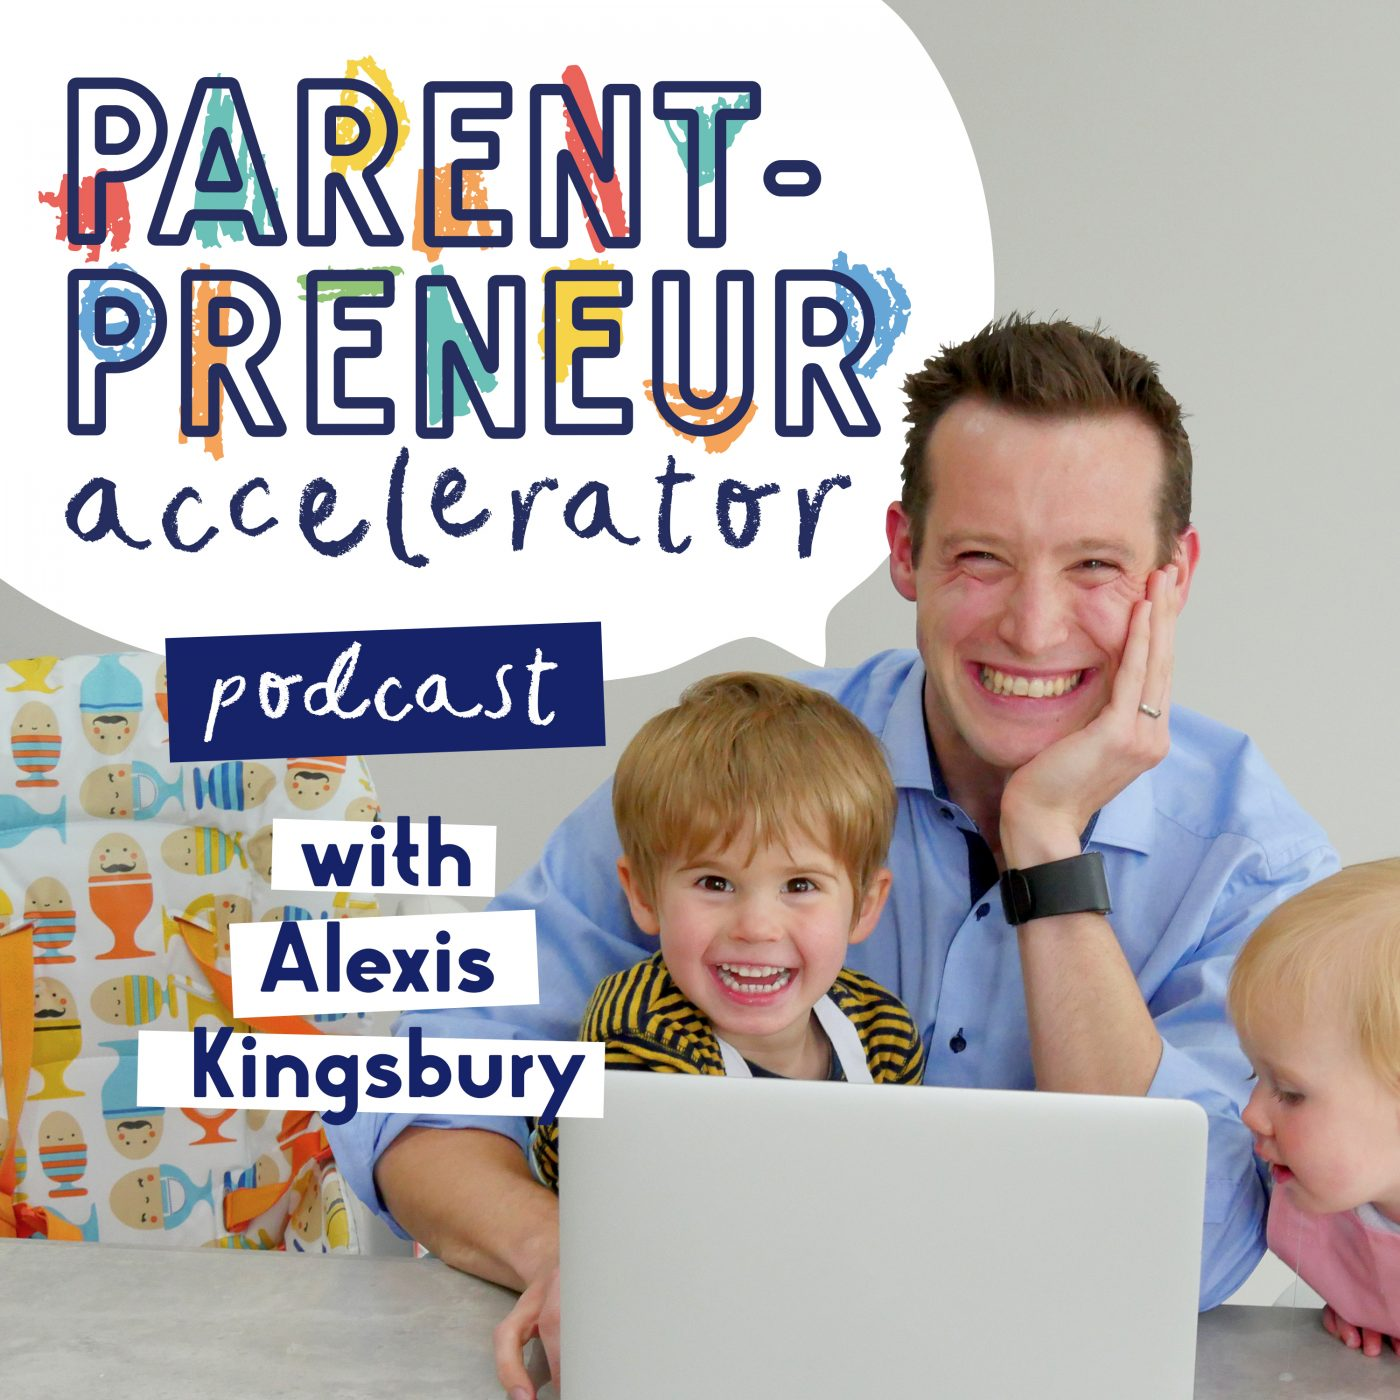 The Parentpreneur Accelerator Podcast